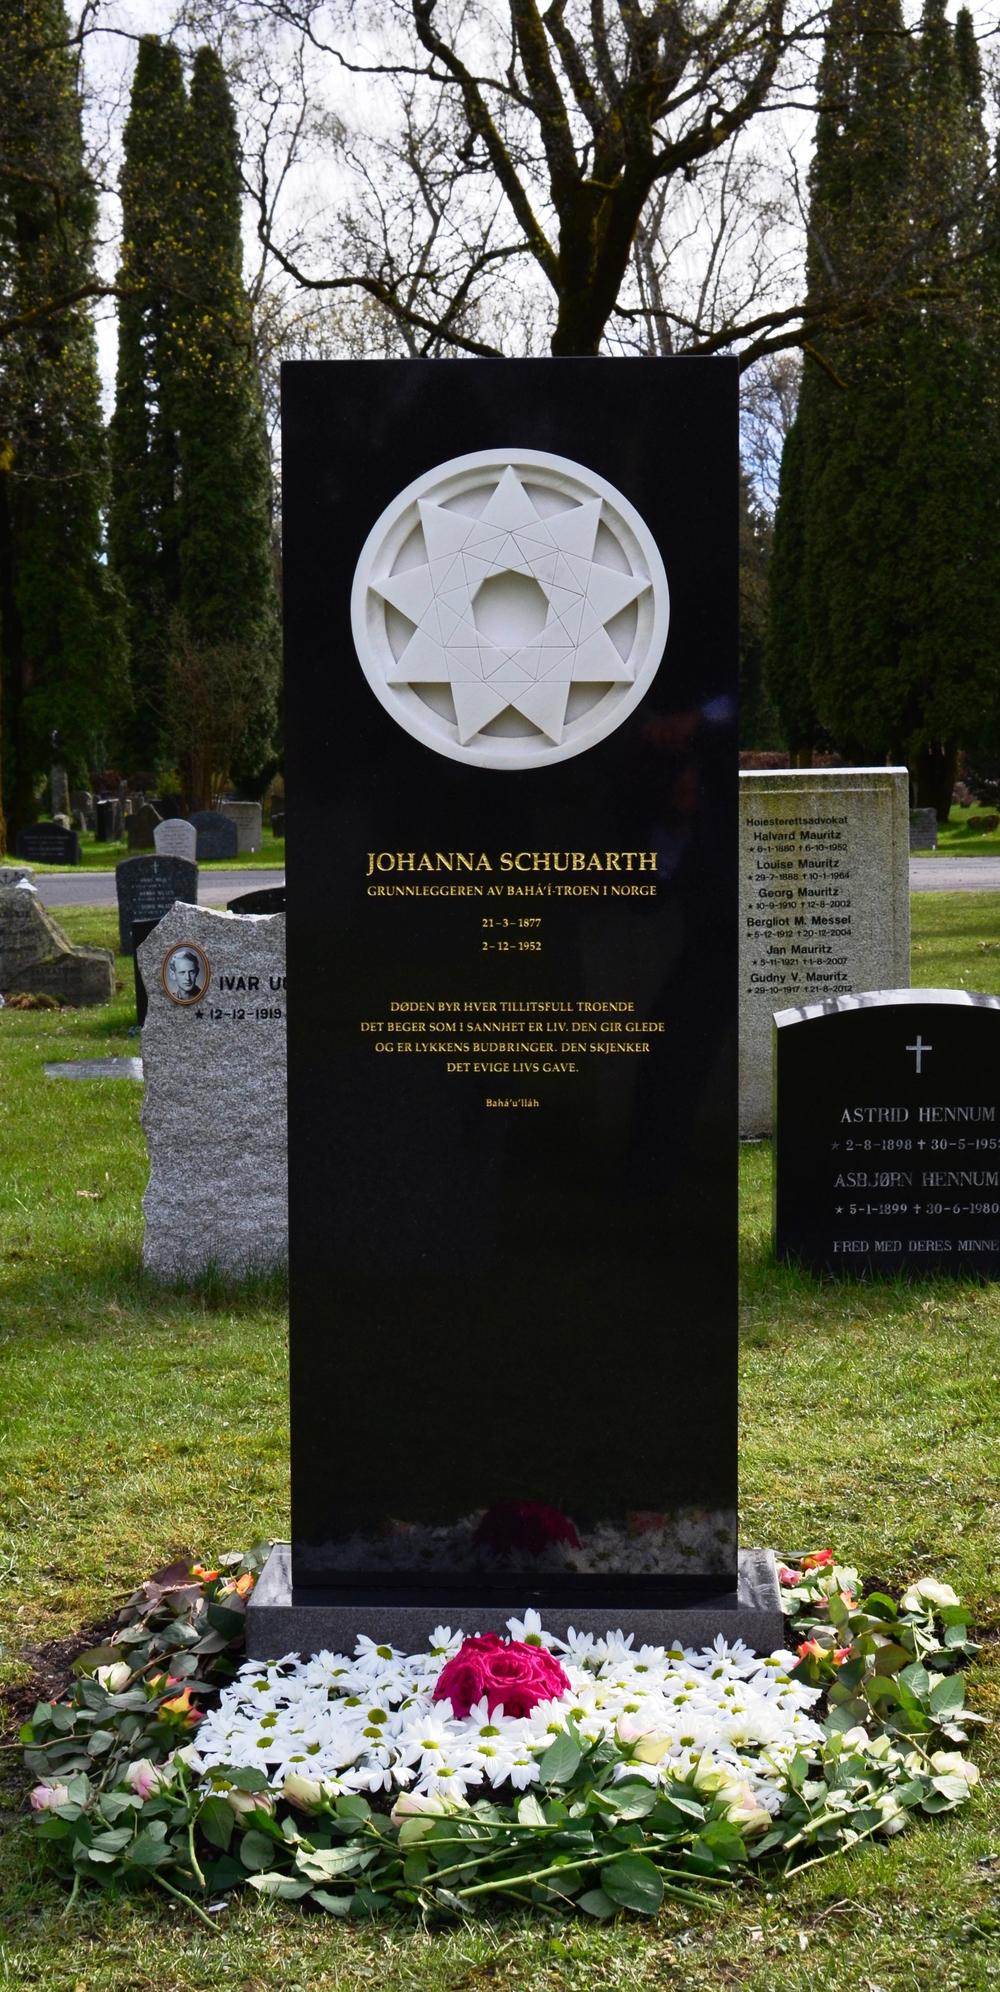 MINNESTEINEN: Den nye steinen reist til minne for Johanna Schubarth.